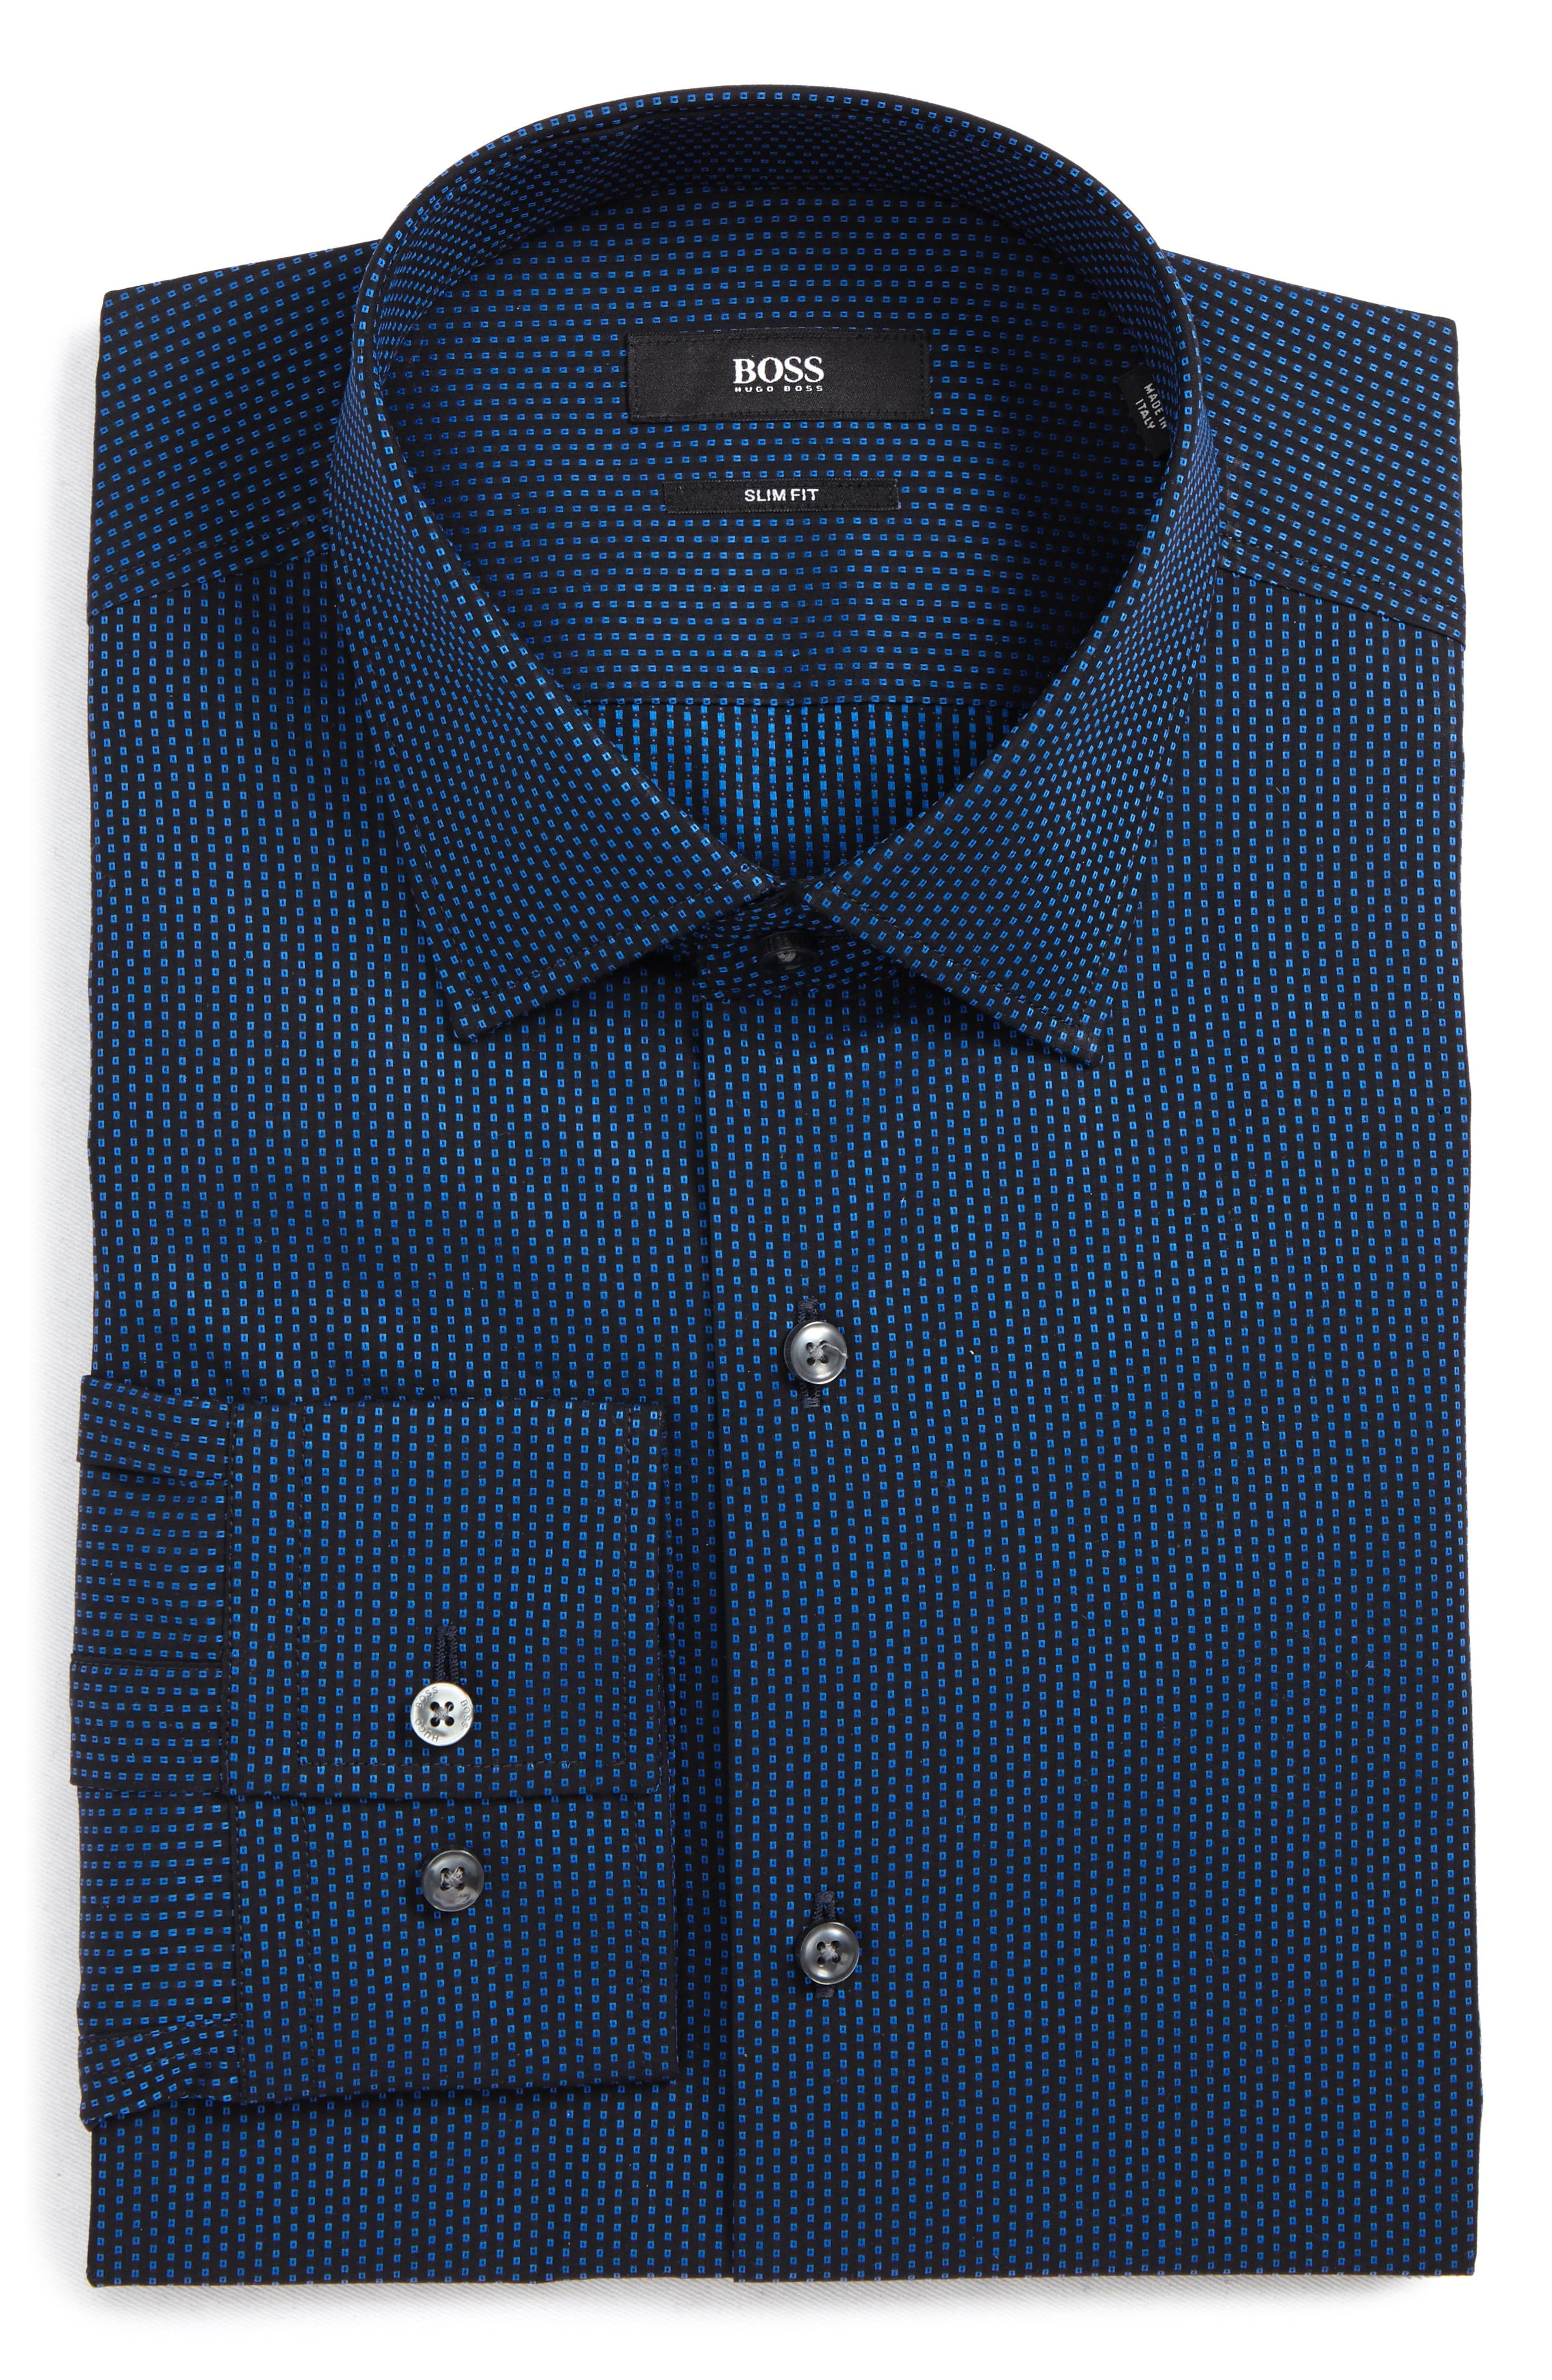 Jenno Slim Fit Print Dress Shirt,                             Main thumbnail 1, color,                             Navy